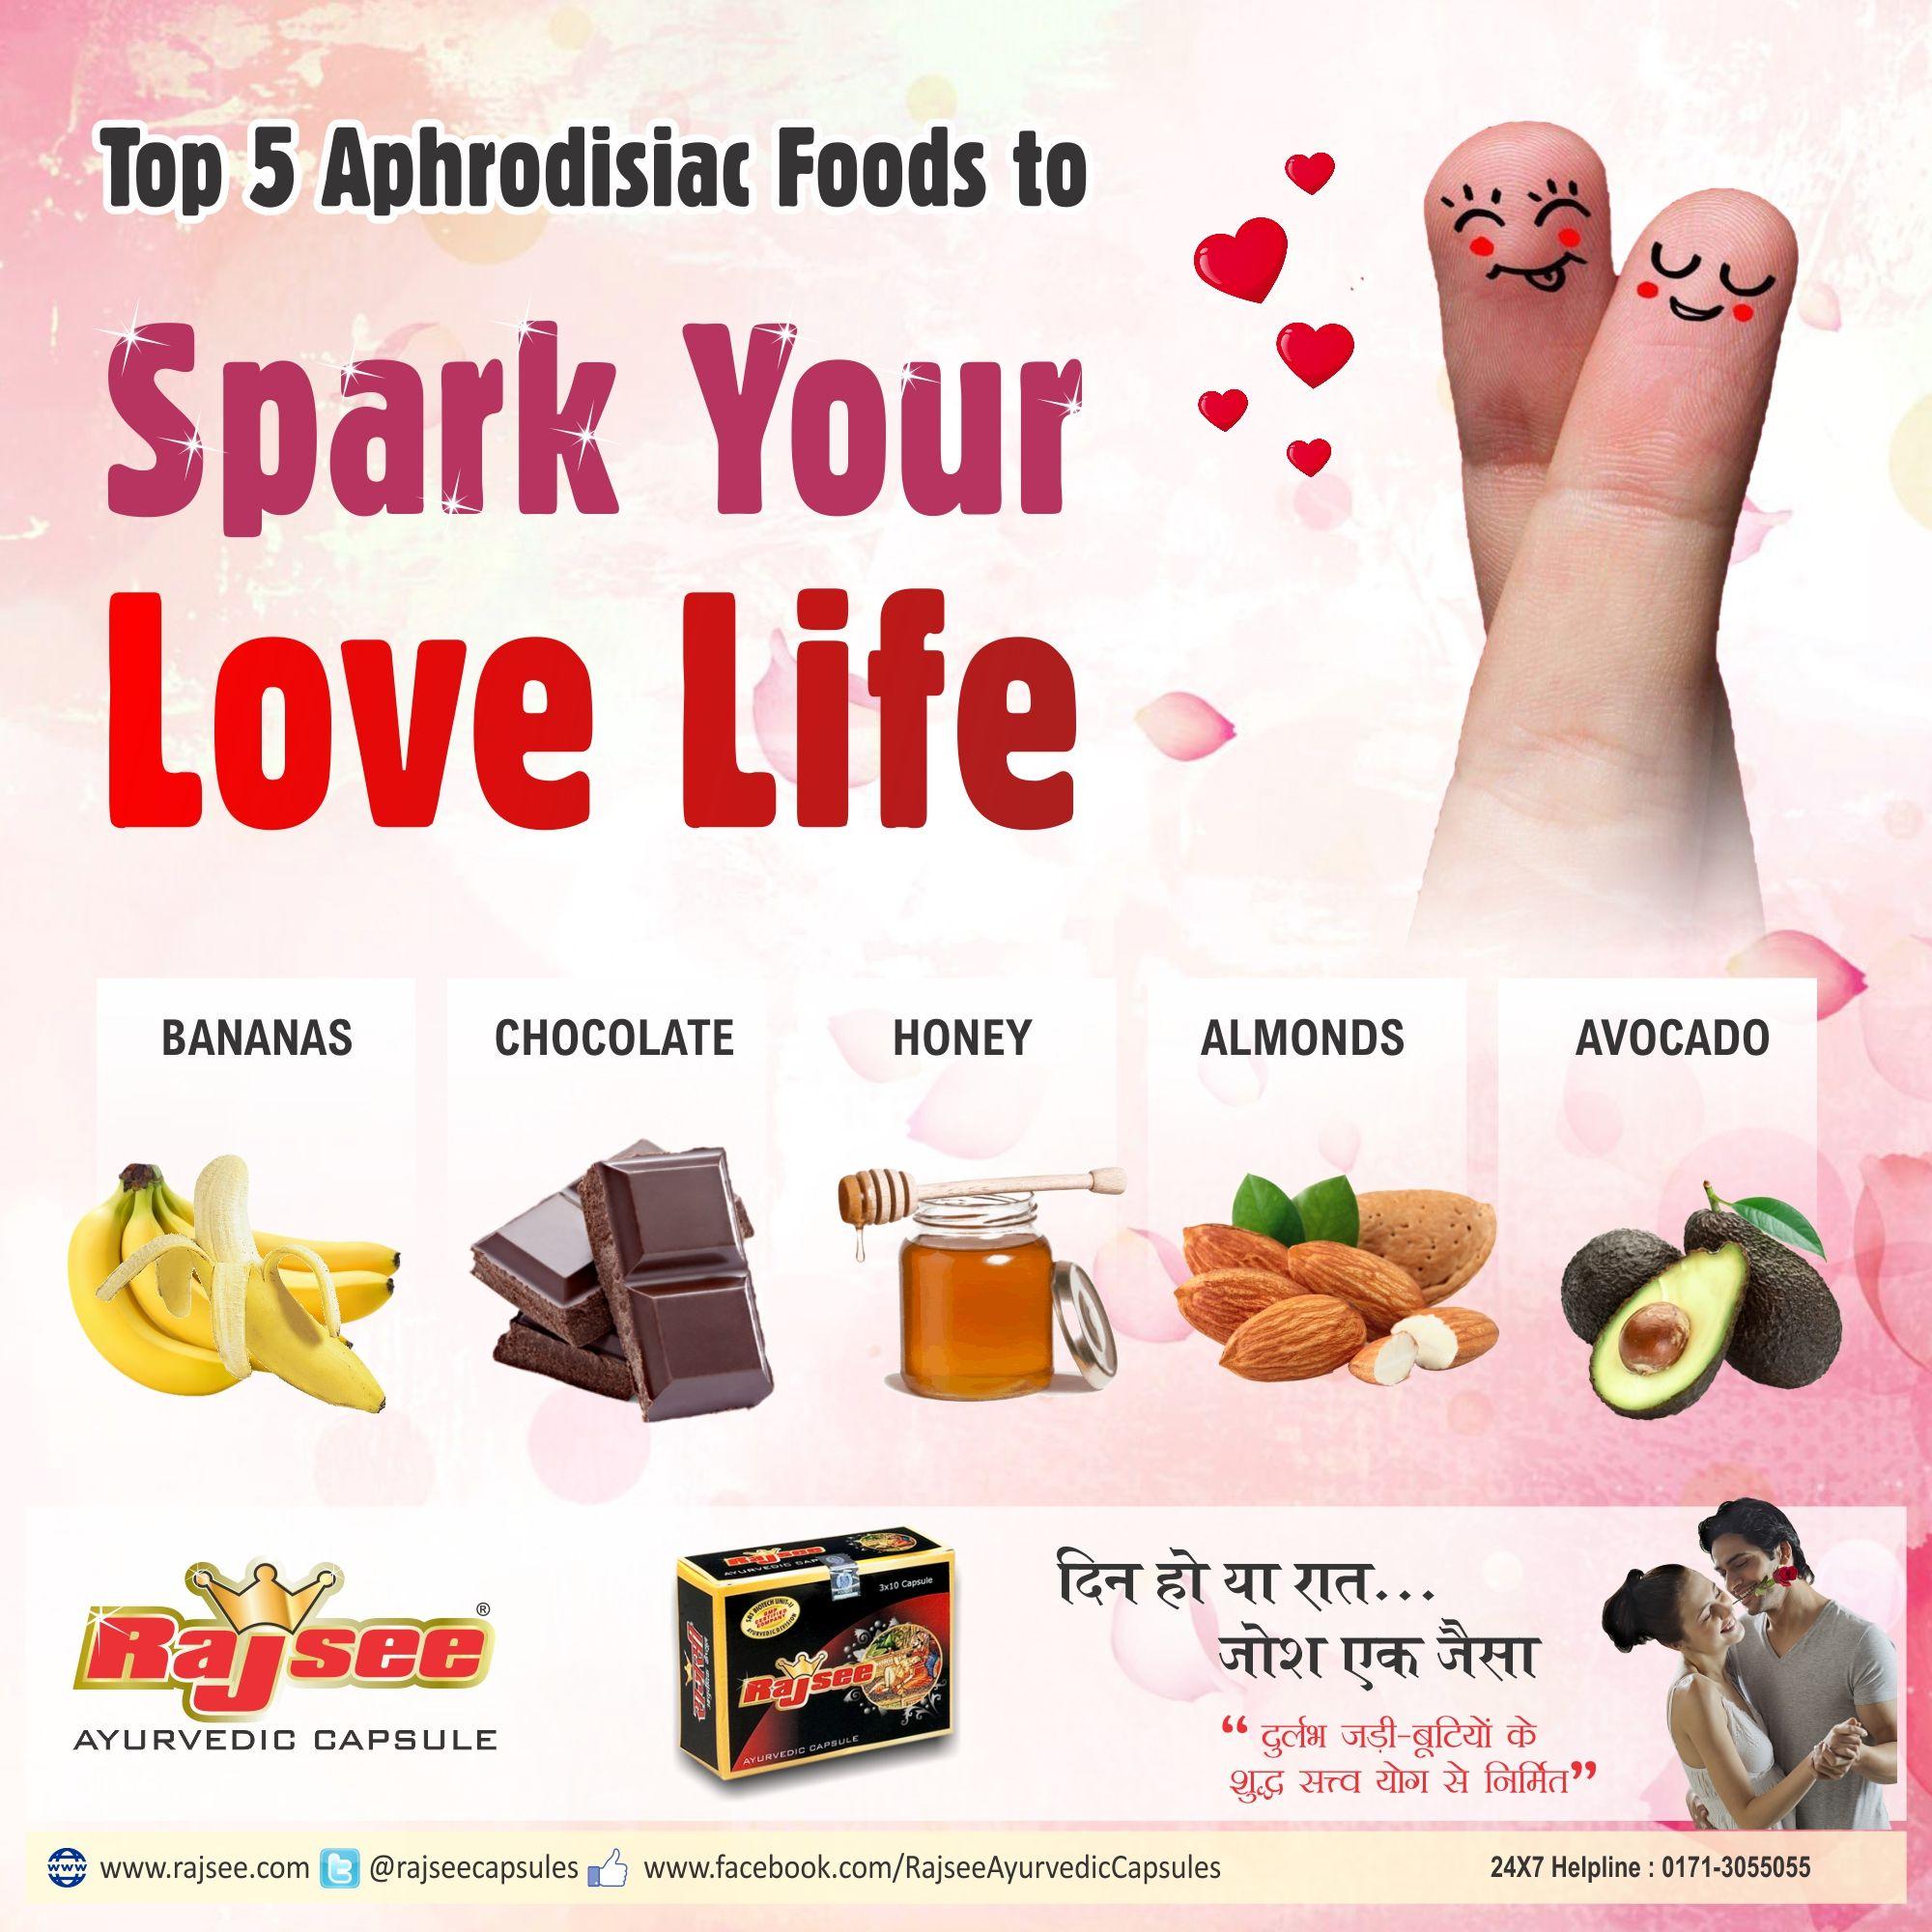 Male aphrodisiac foods